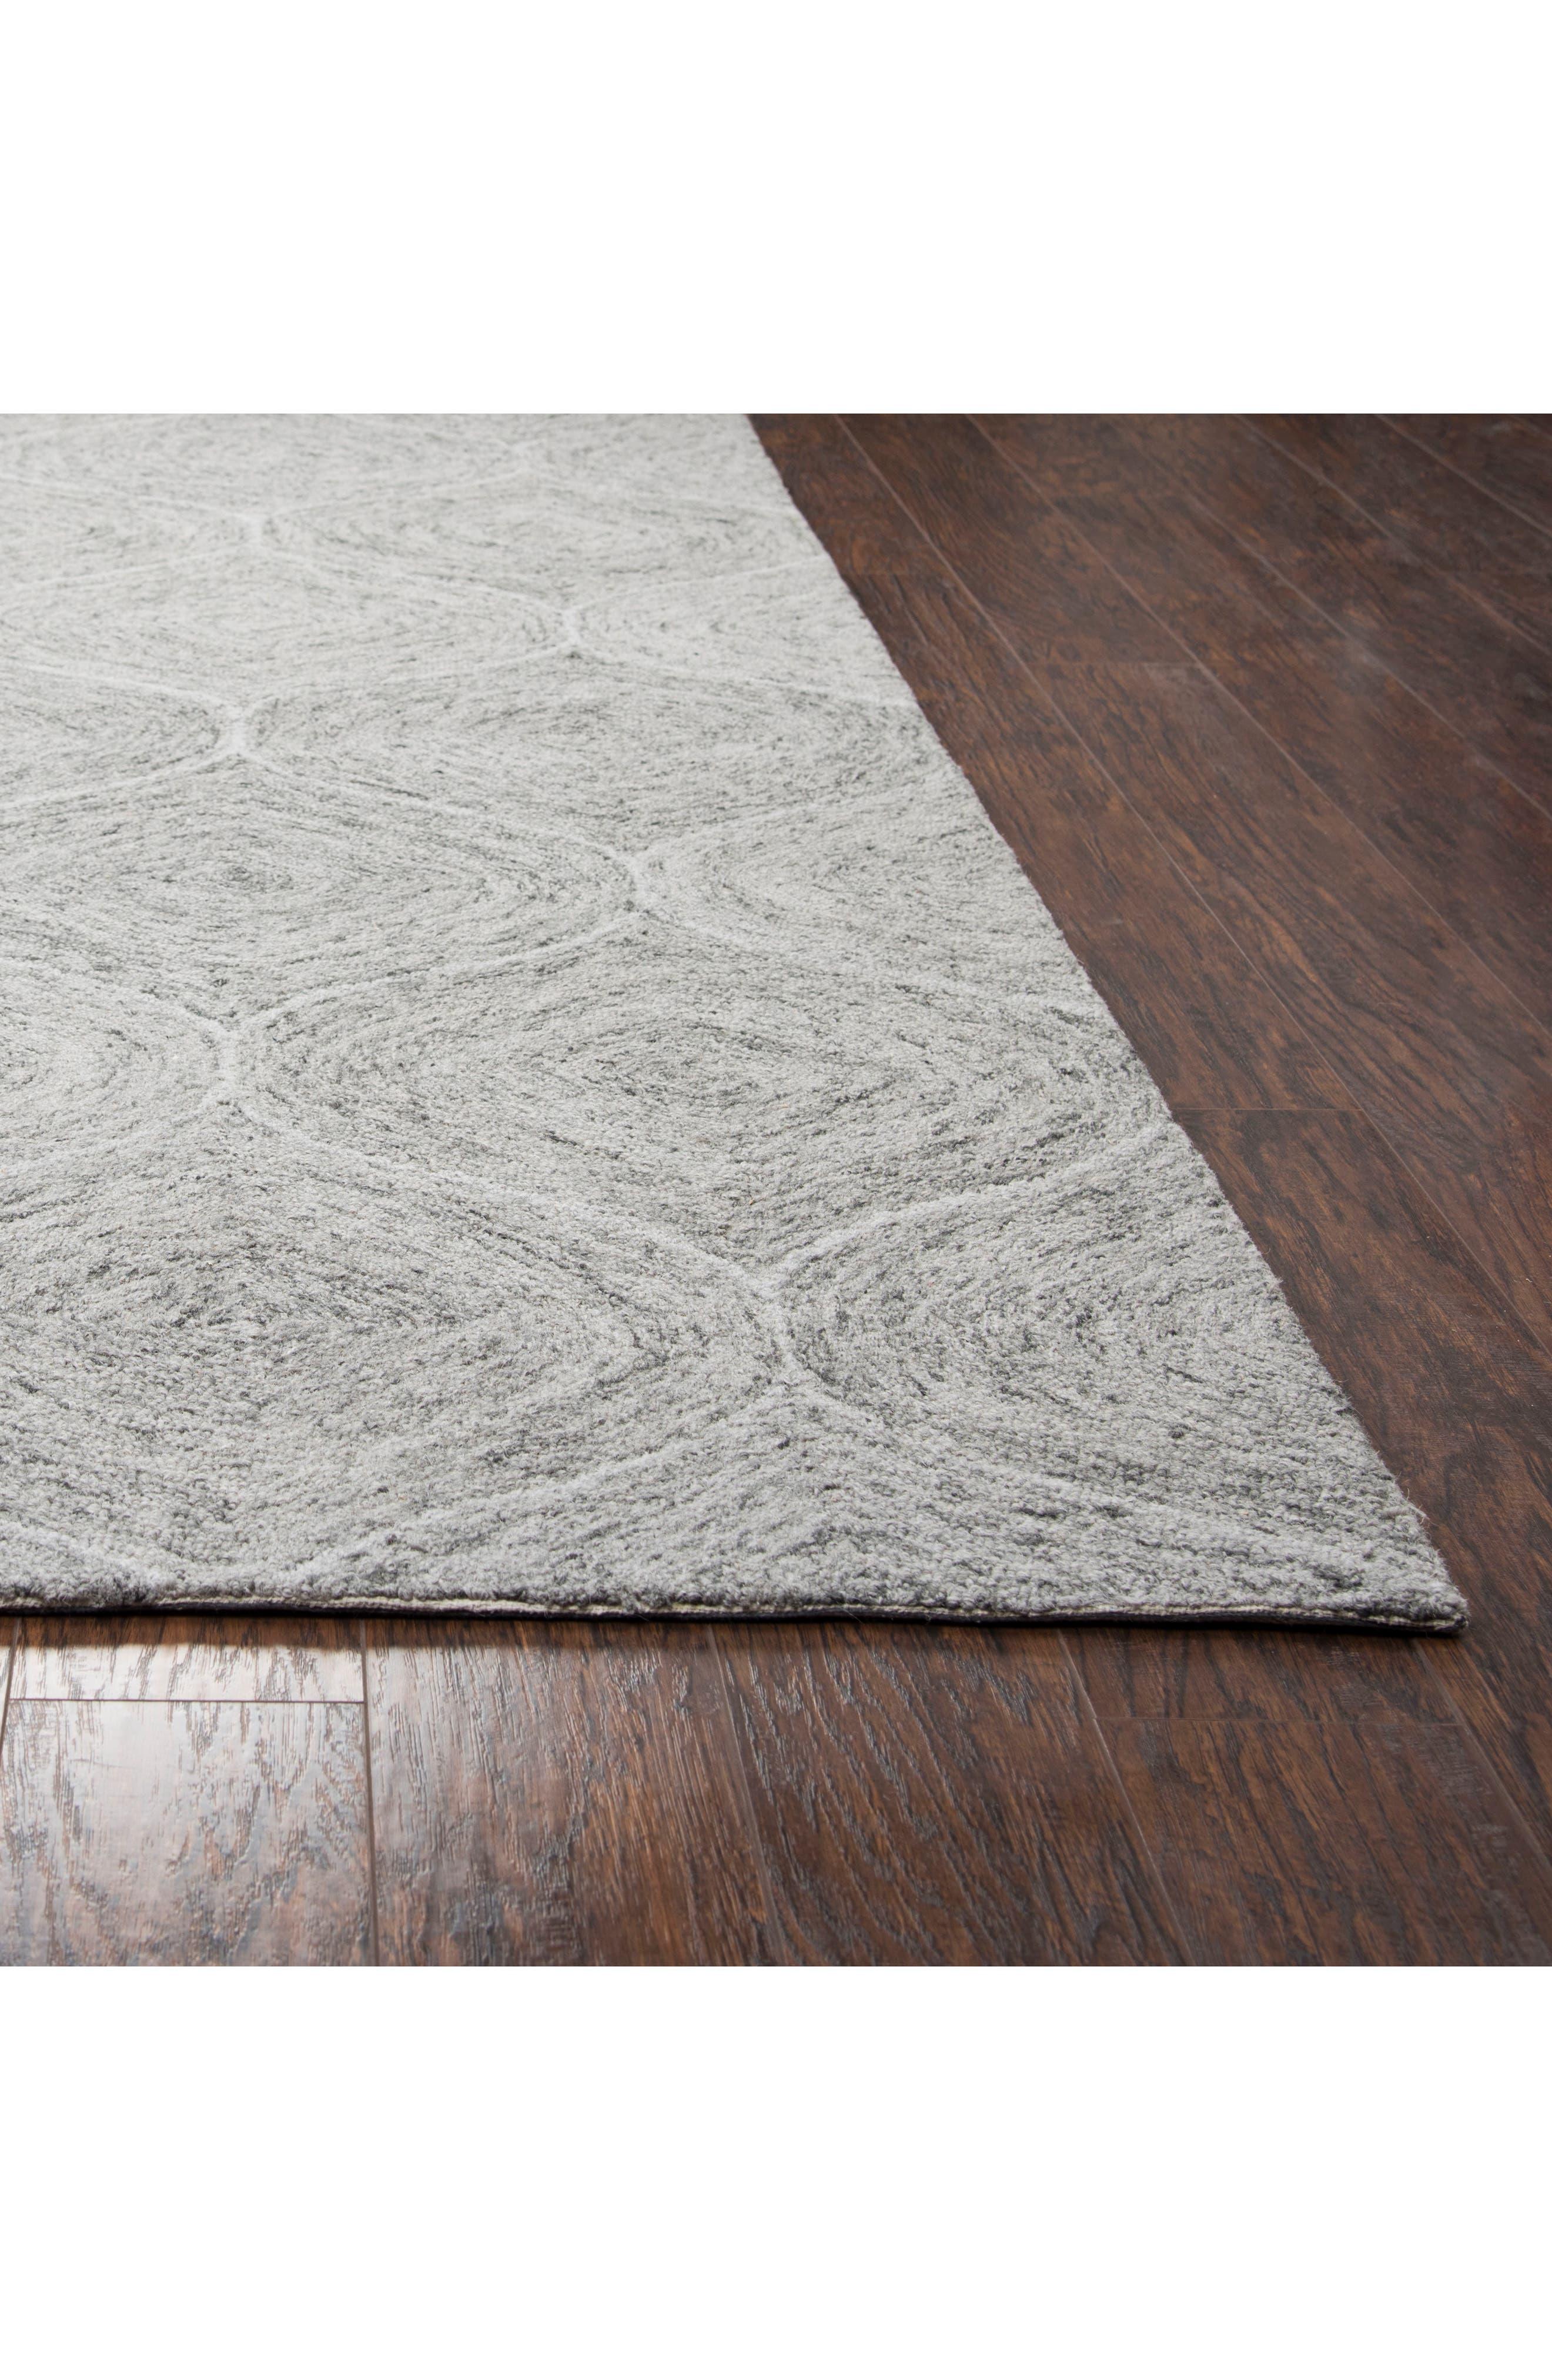 Irregular Diamond Hand Tufted Wool Area Rug,                             Alternate thumbnail 2, color,                             Grey